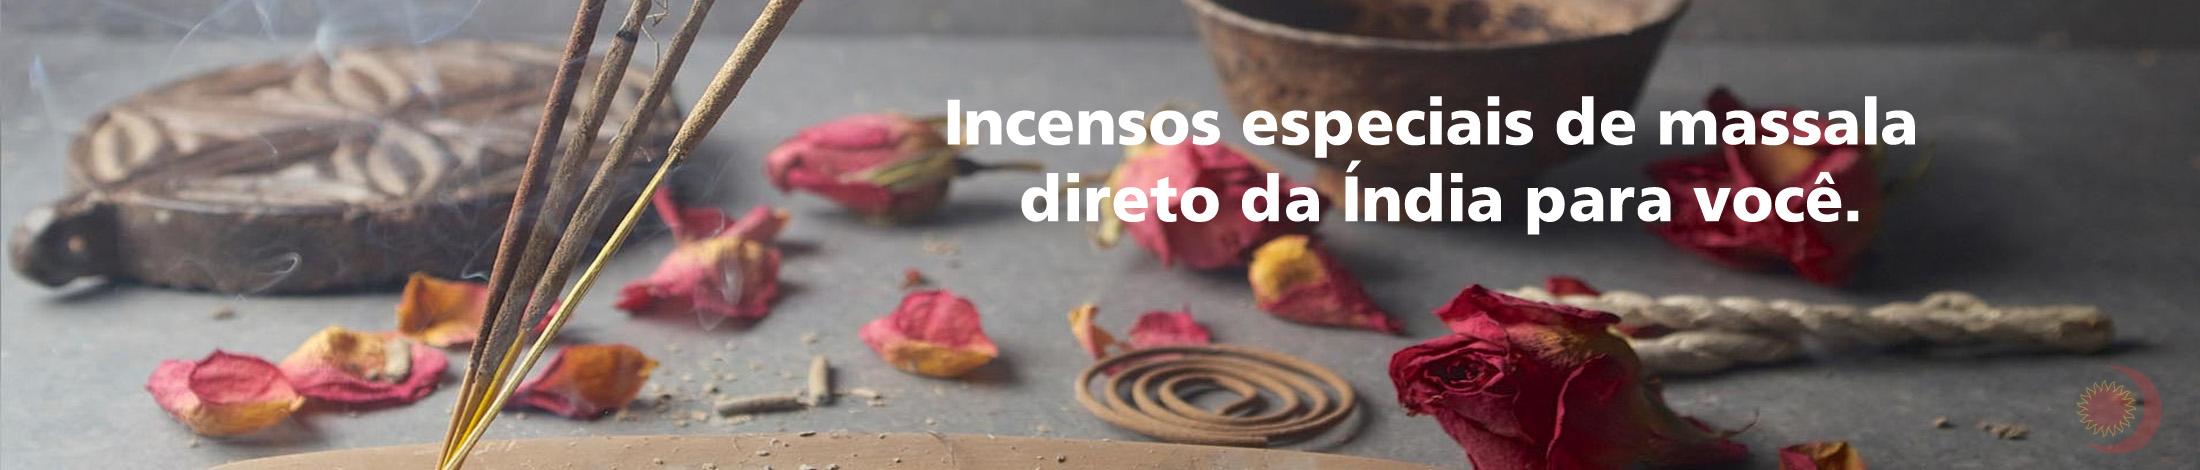 https://cdn.brasilesoterico.com/imagens_banners/341a9dcca11b2dbe259a8e77b93cbc5b.jpg